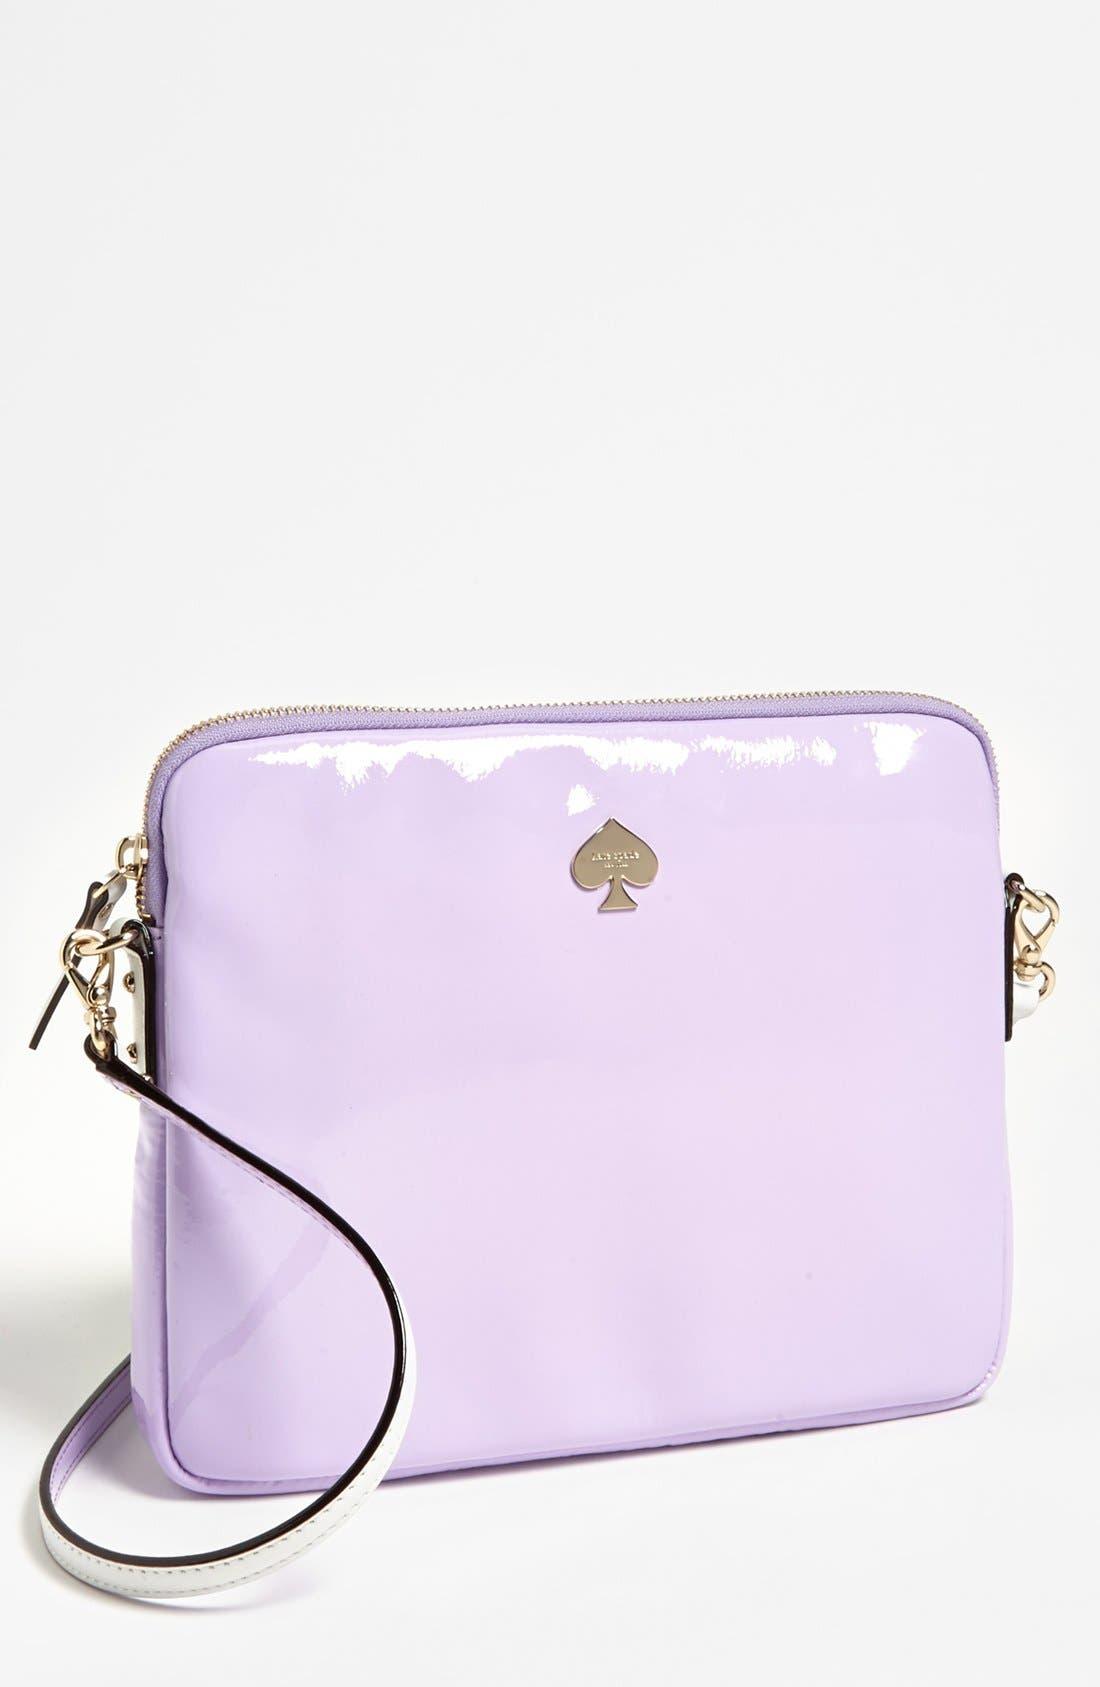 Main Image - kate spade new york 'bryce - flicker' patent leather iPad crossbody bag